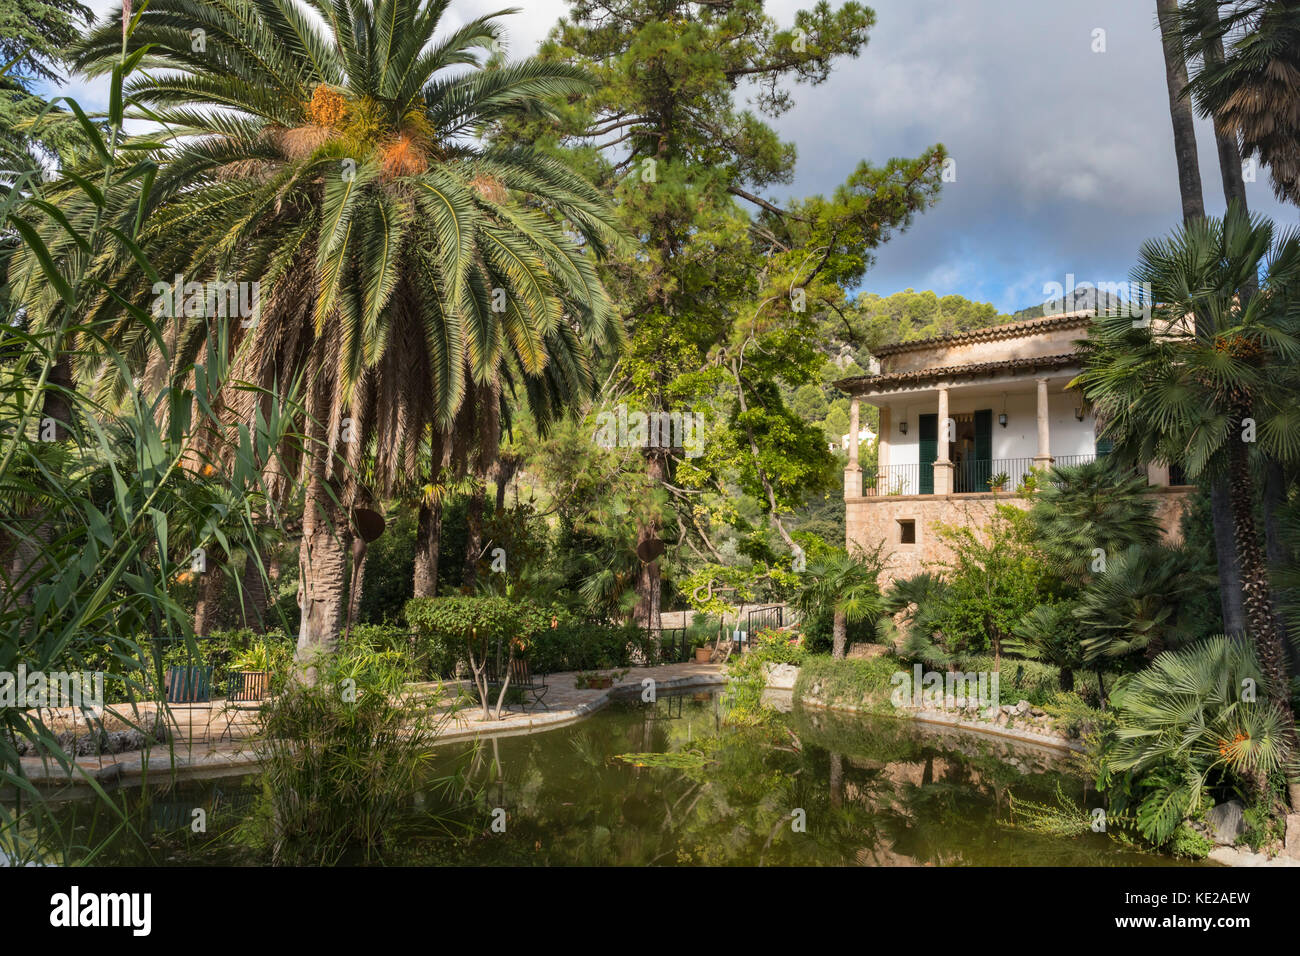 Jardines de alfabia stock photos jardines de alfabia for Jardines mallorca